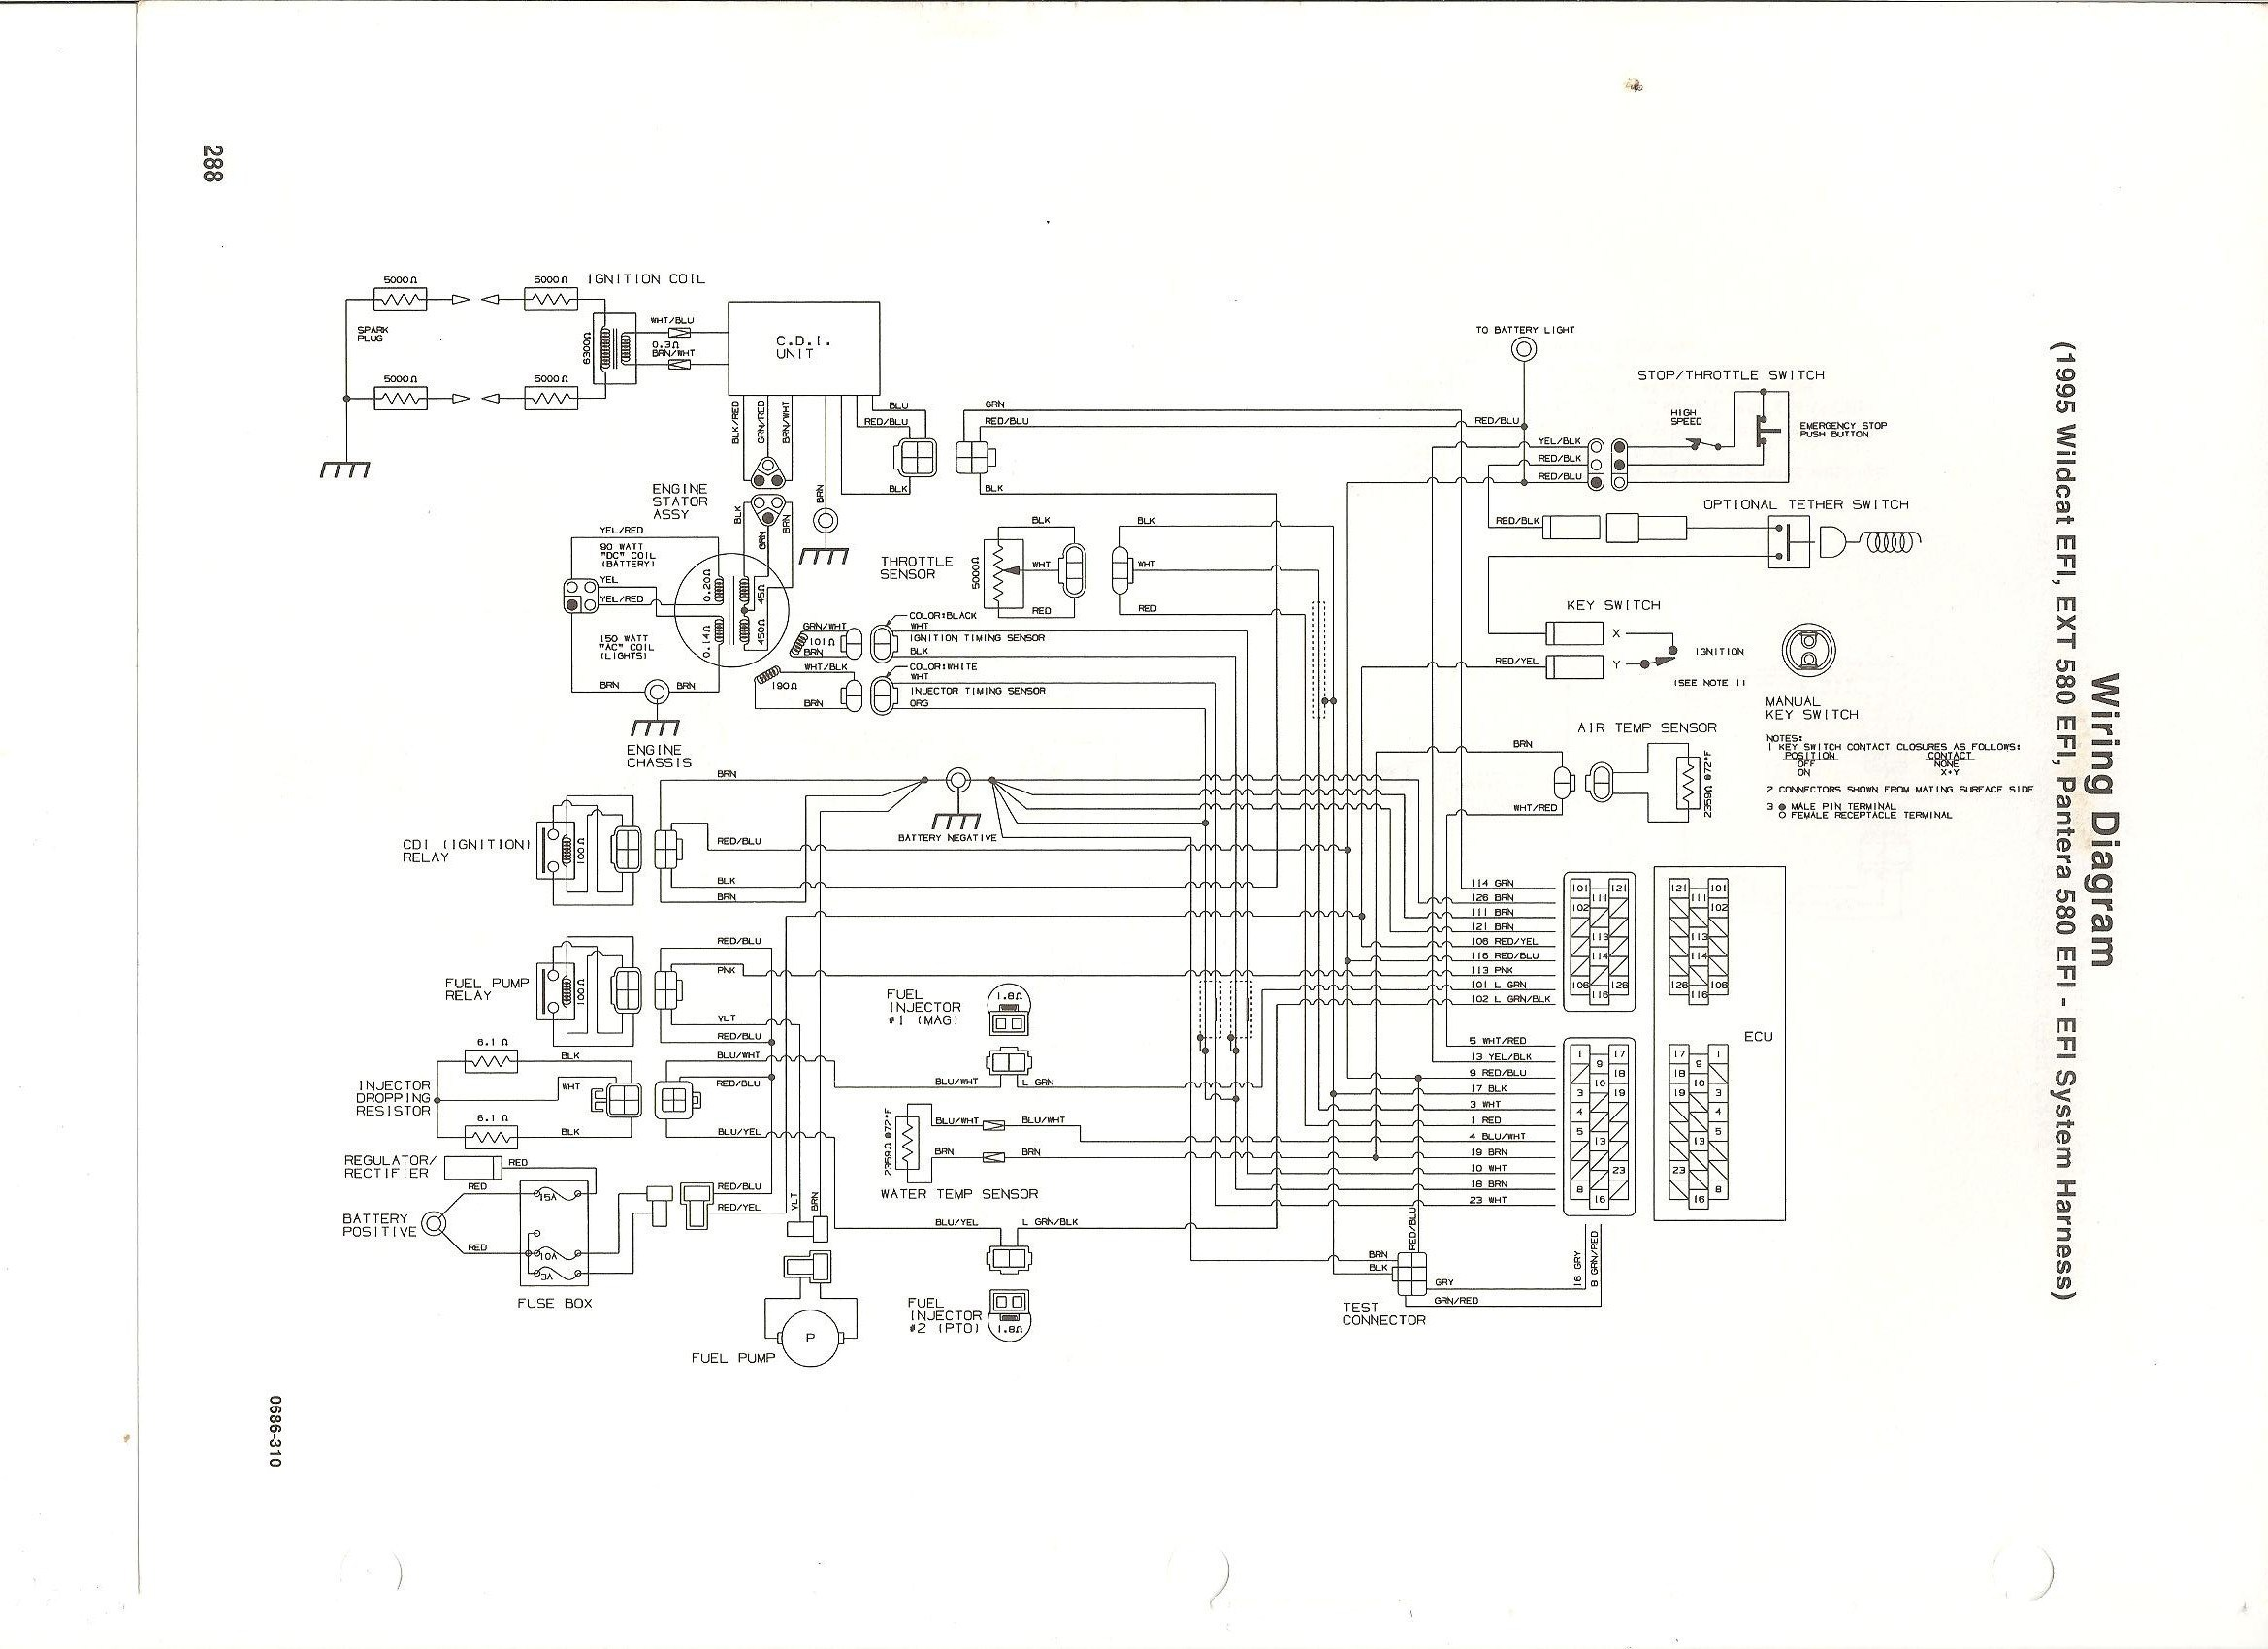 zuma wiring diagram ga 4186  polaris trail boss 330 wiring diagram  polaris trail boss 330 wiring diagram